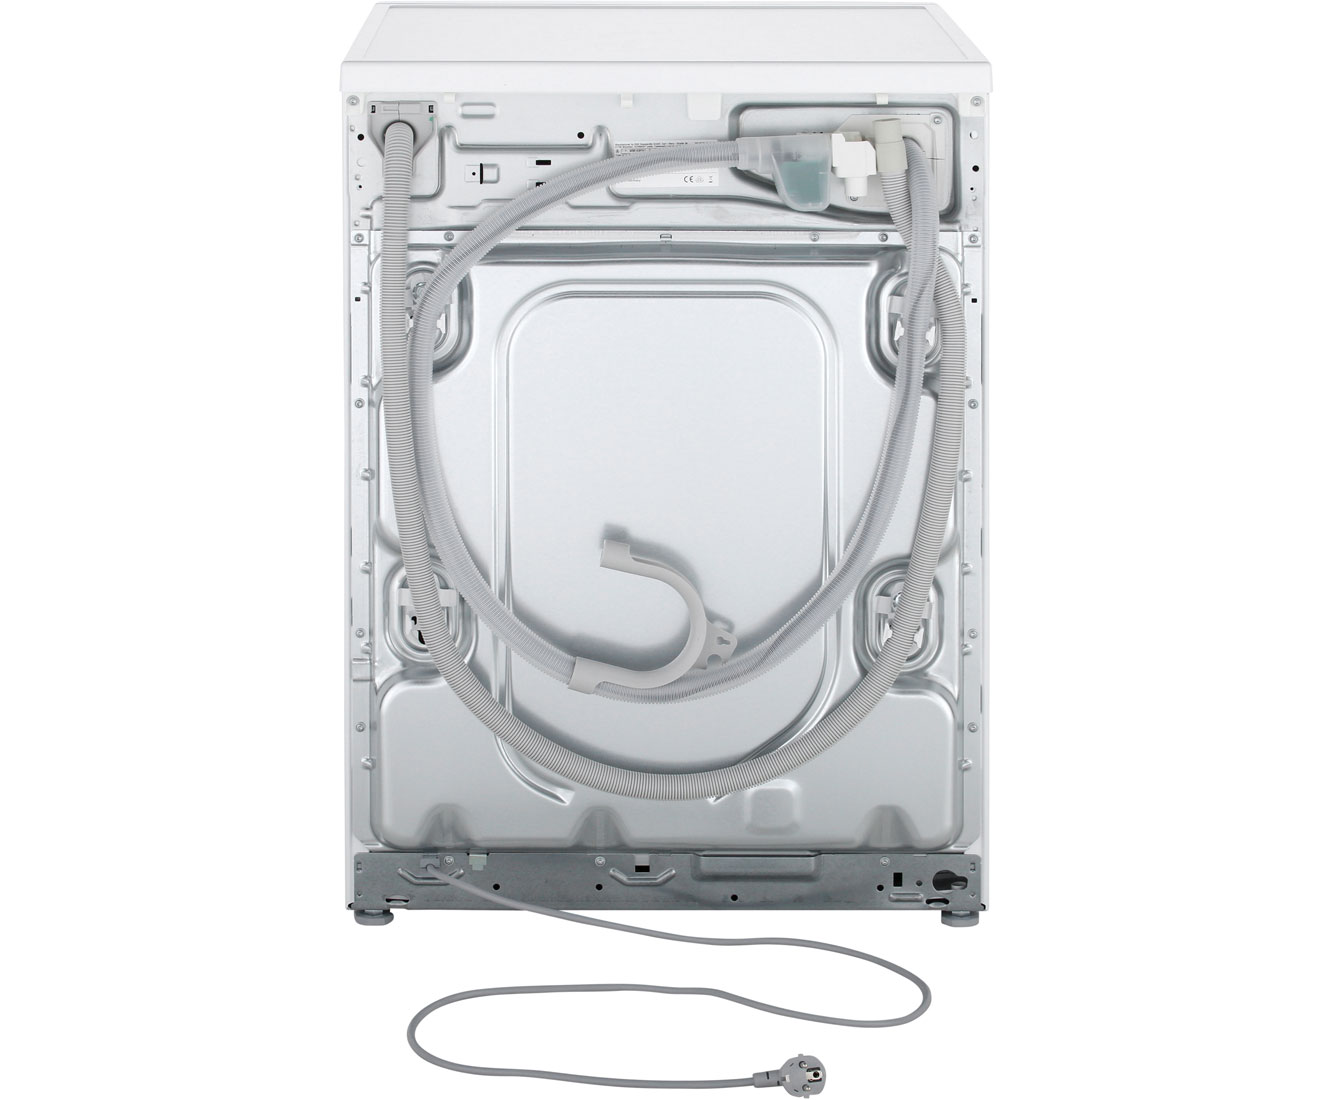 Siemens wm16w541 waschmaschine weiß 8 kg 1600 u min a